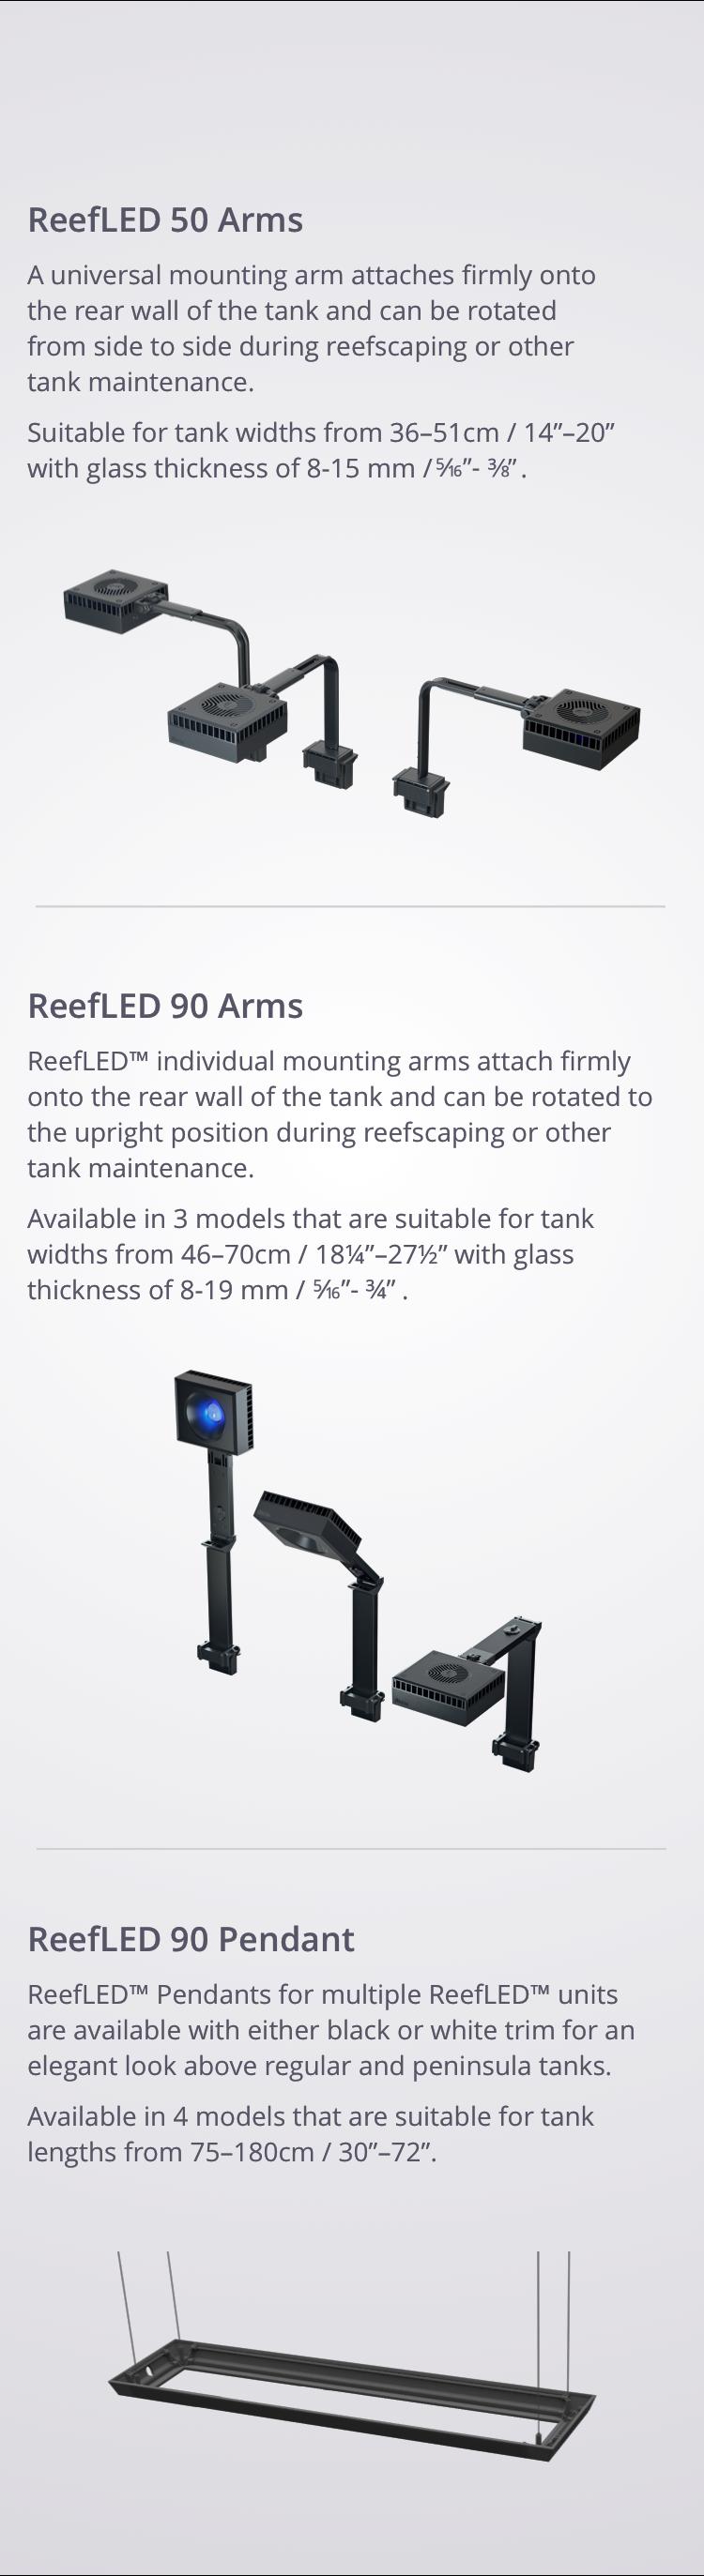 ReefLED Light Mount